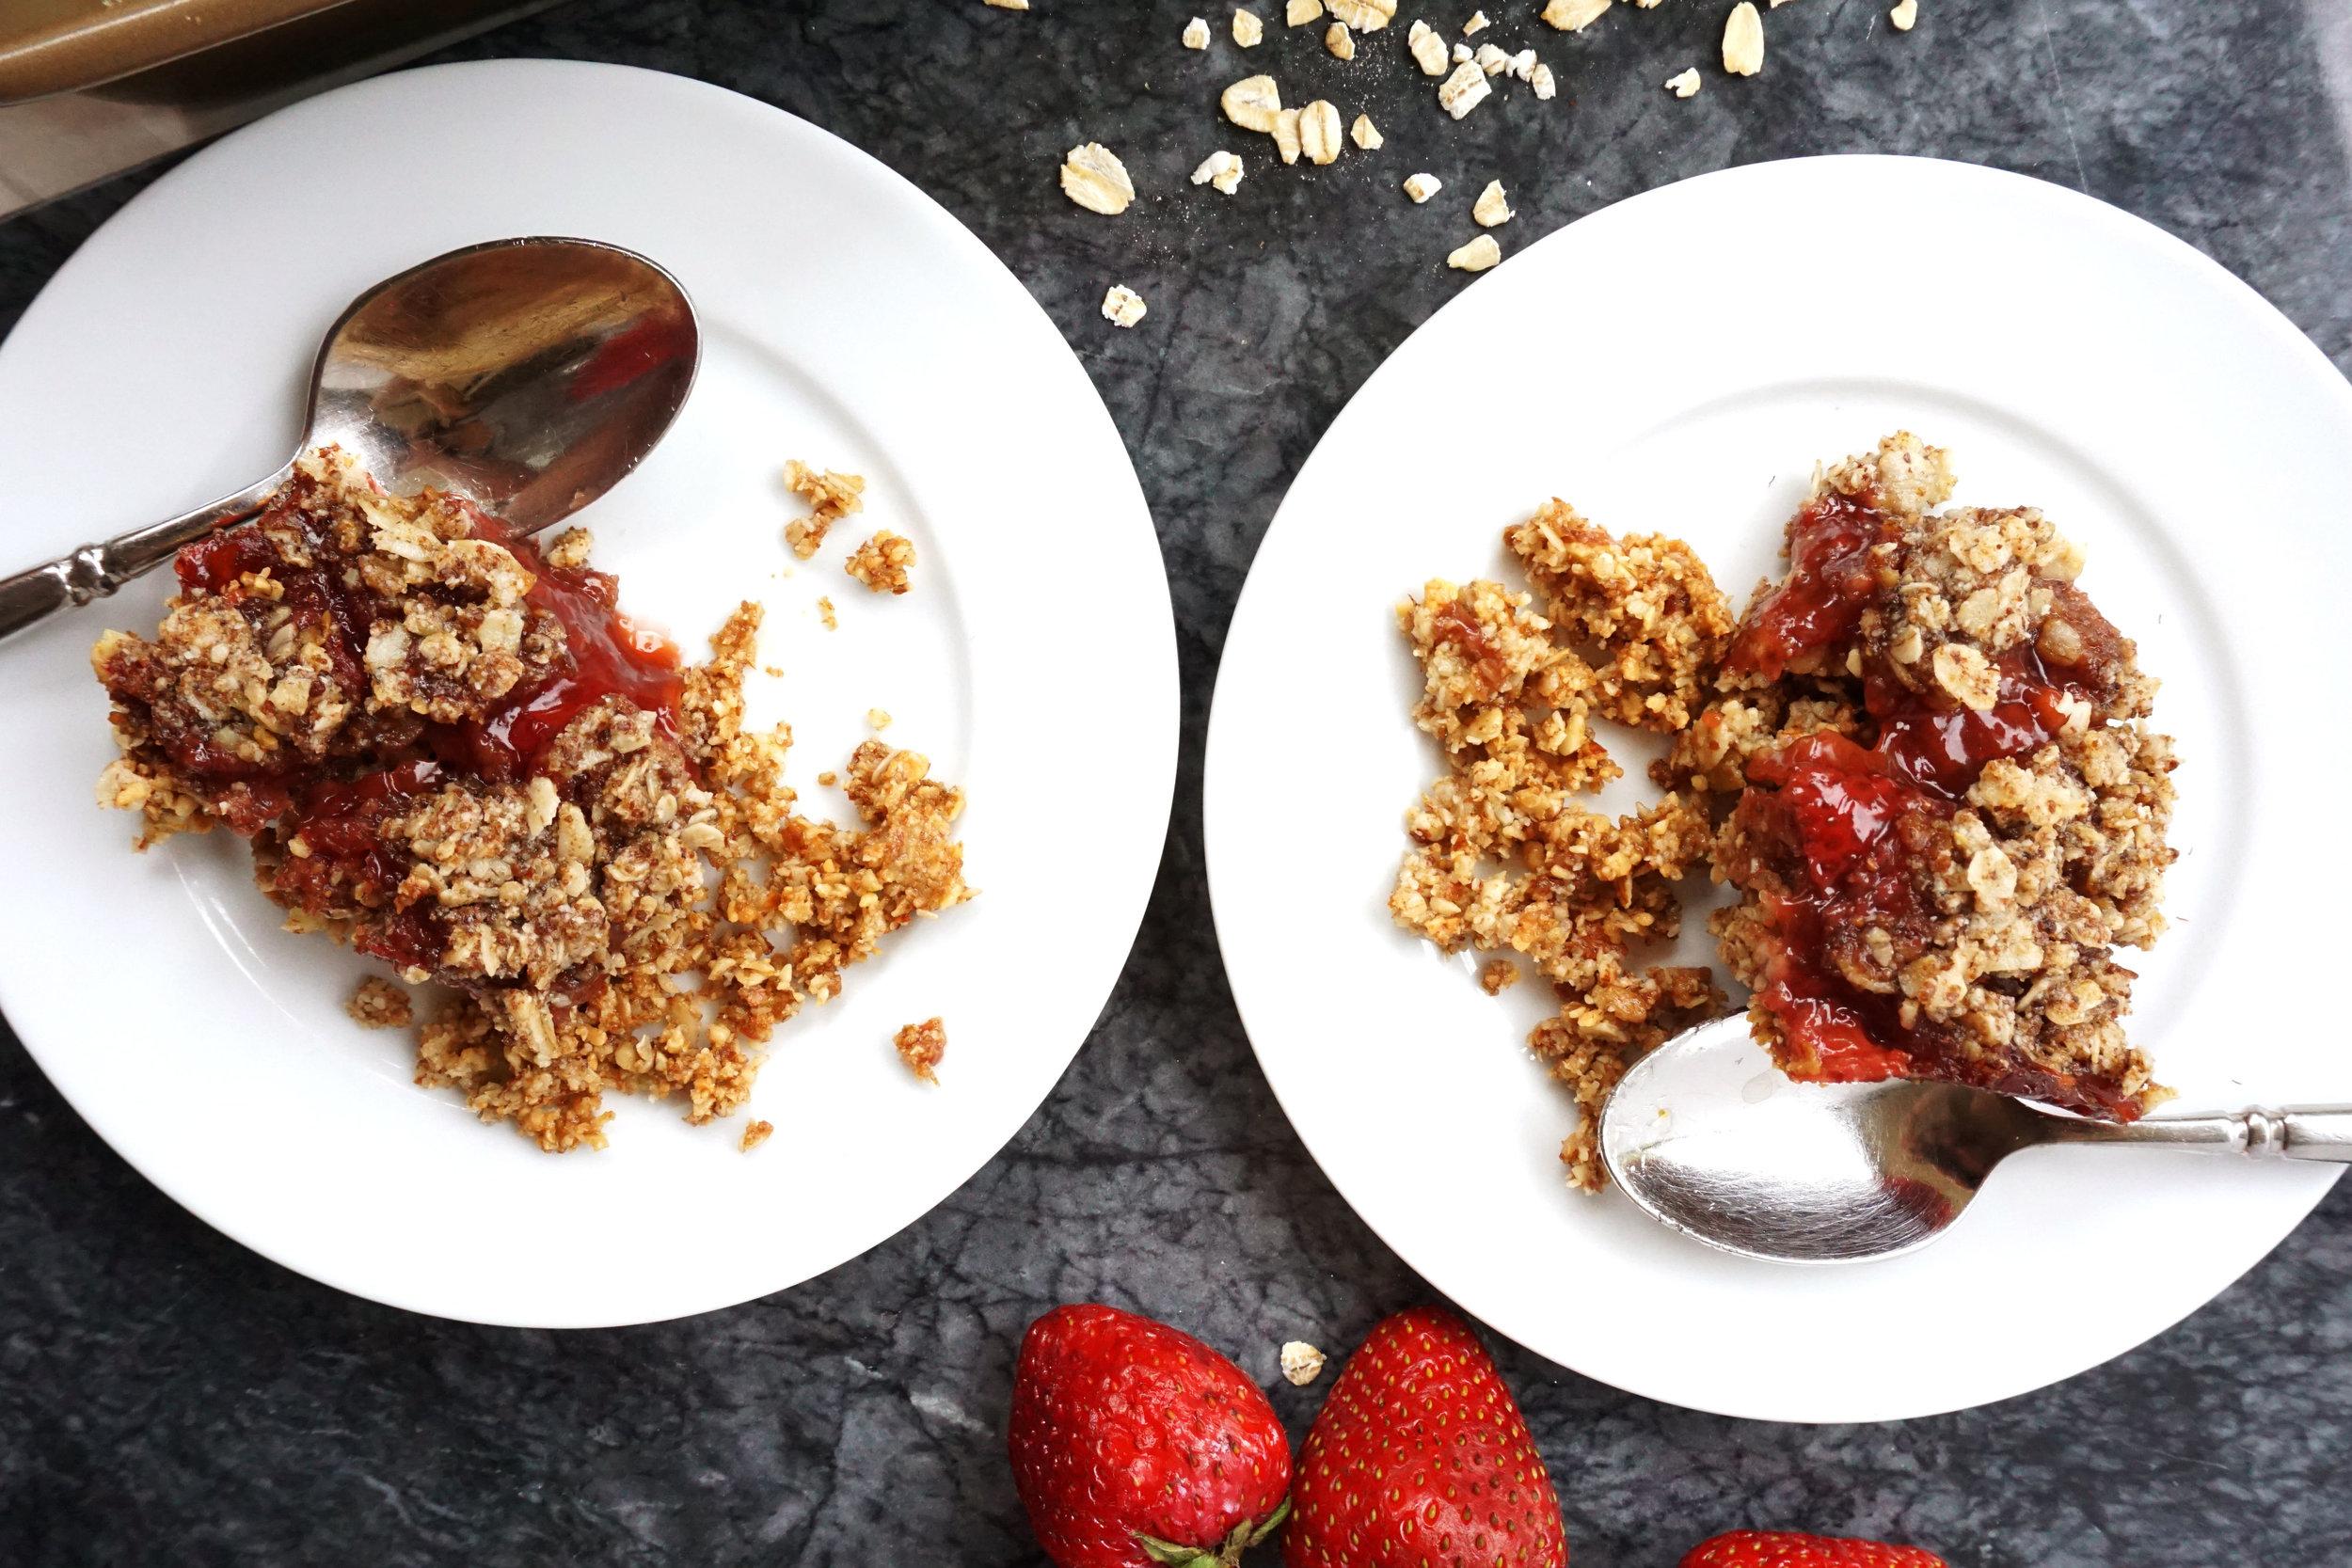 Strawberry Crumble Bars (Vegan, GF)